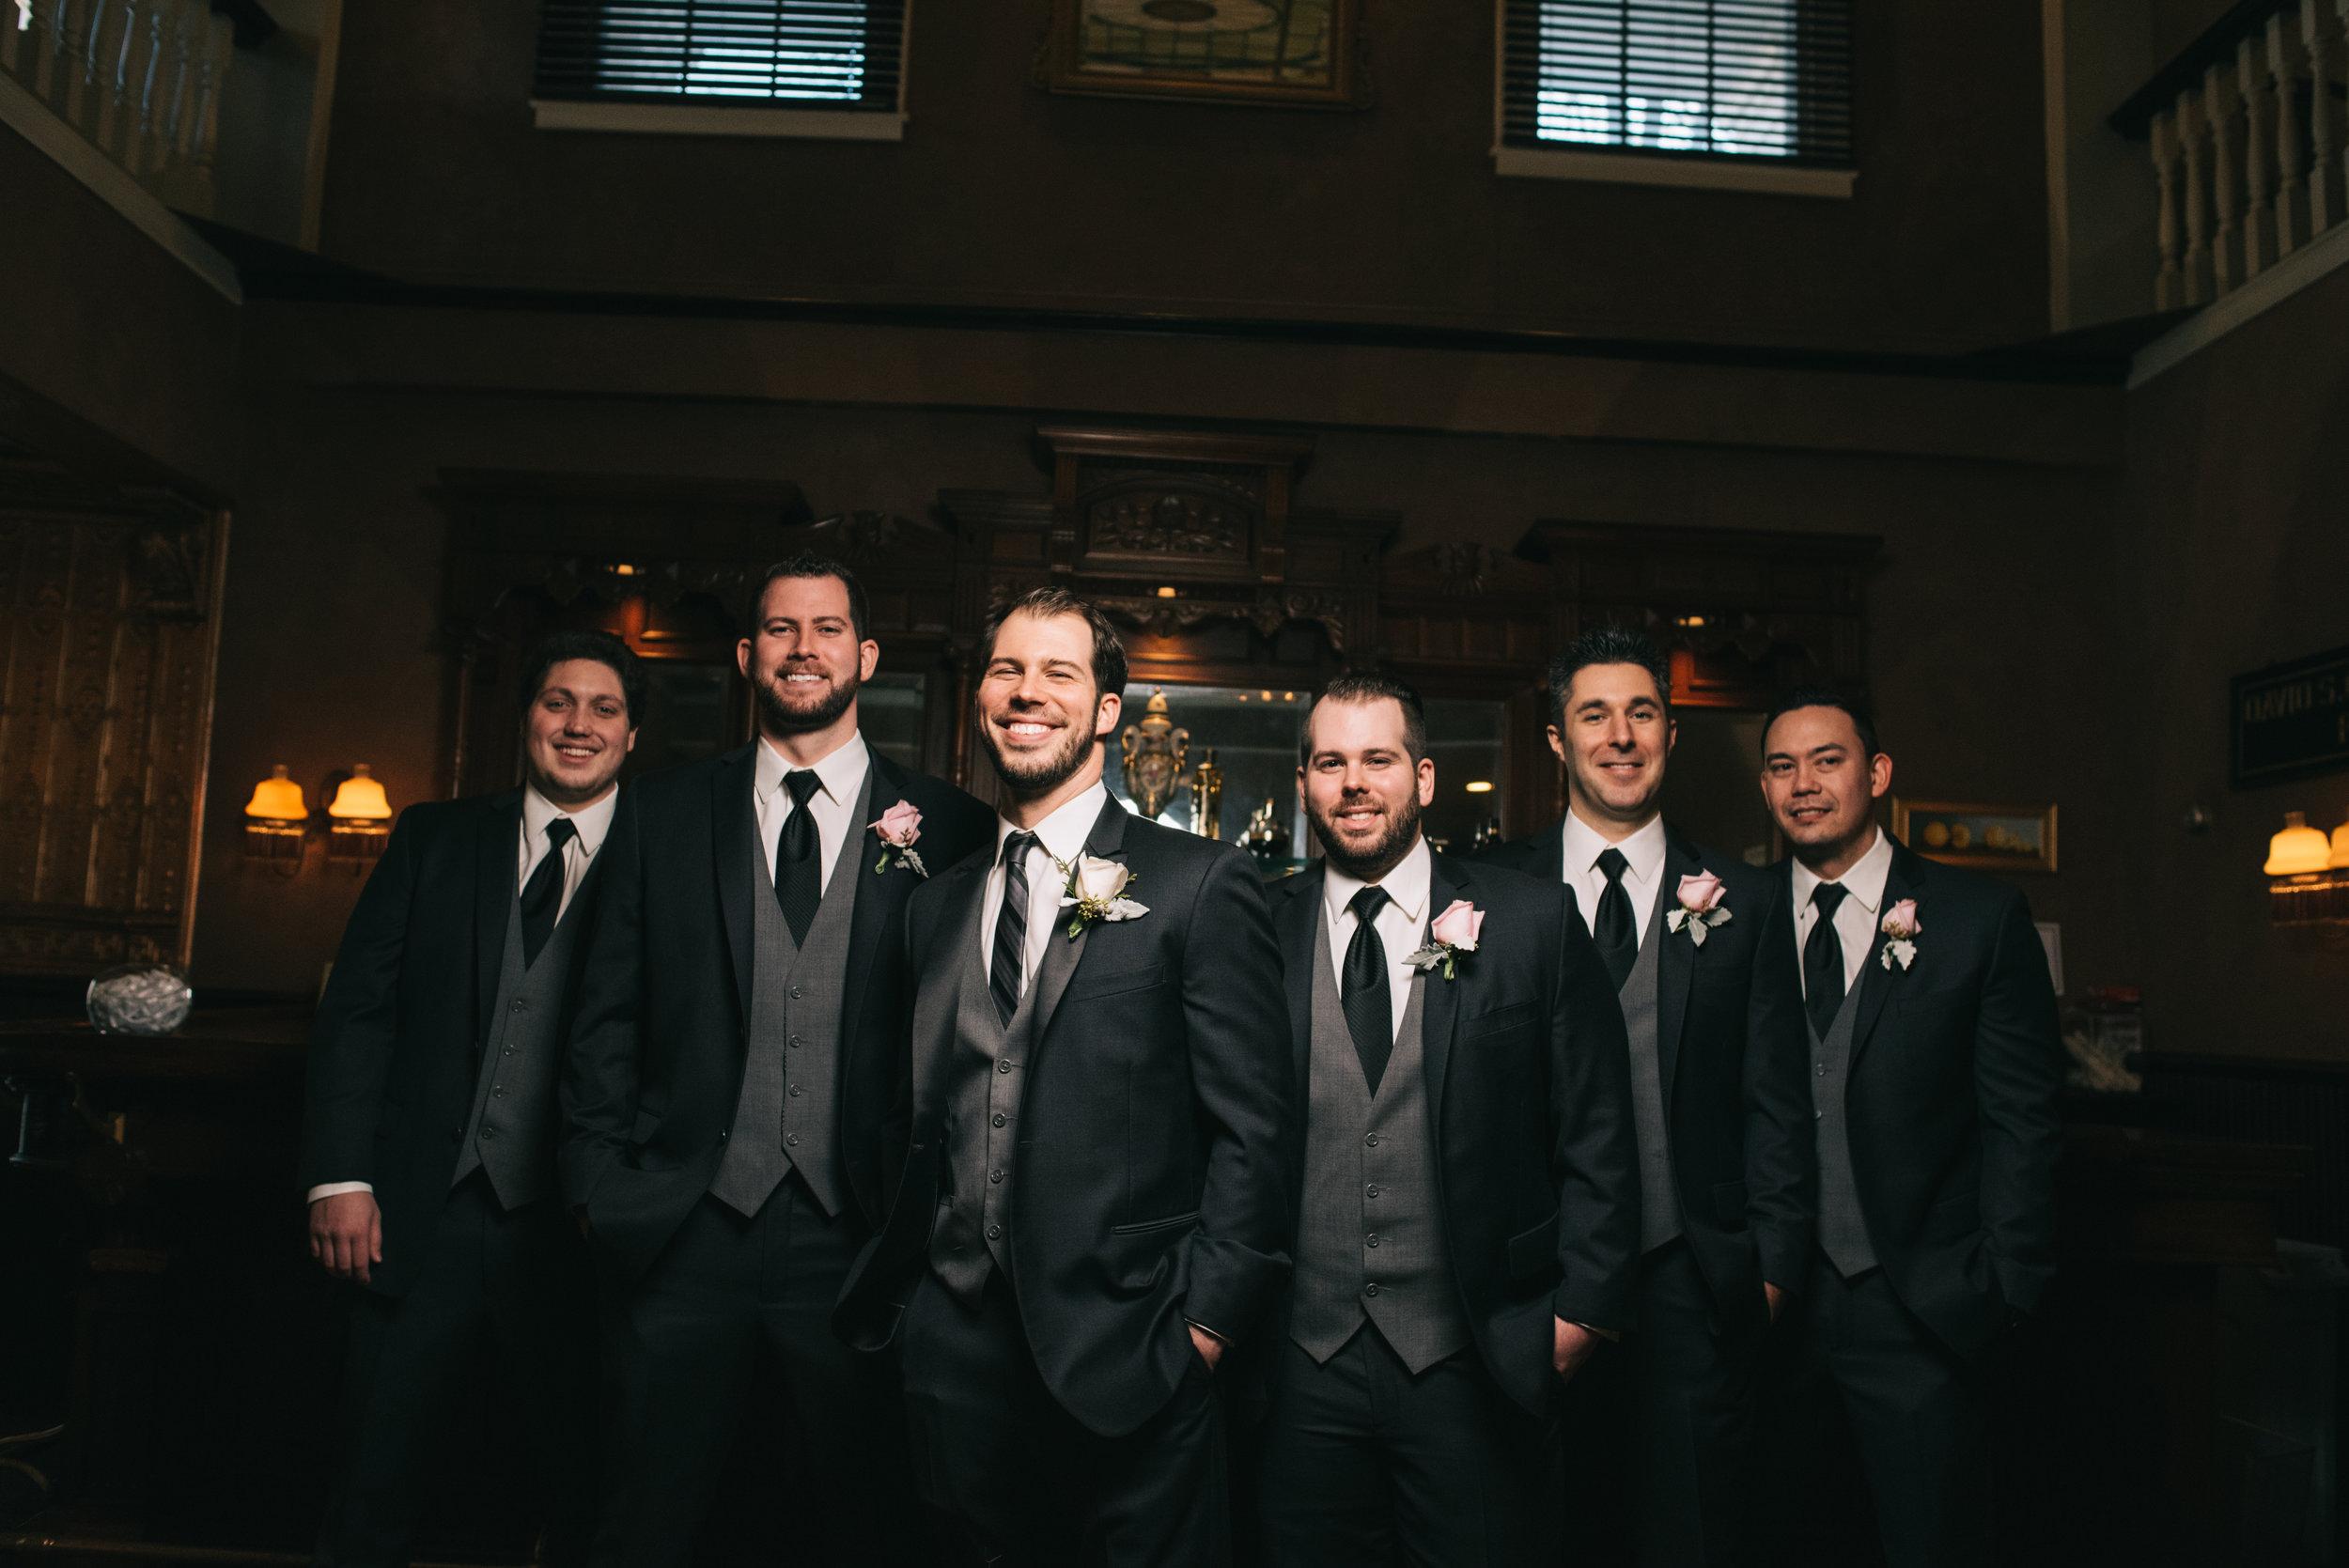 WeddingPhotos | NJPhotographer | Highlights-1-6.jpg